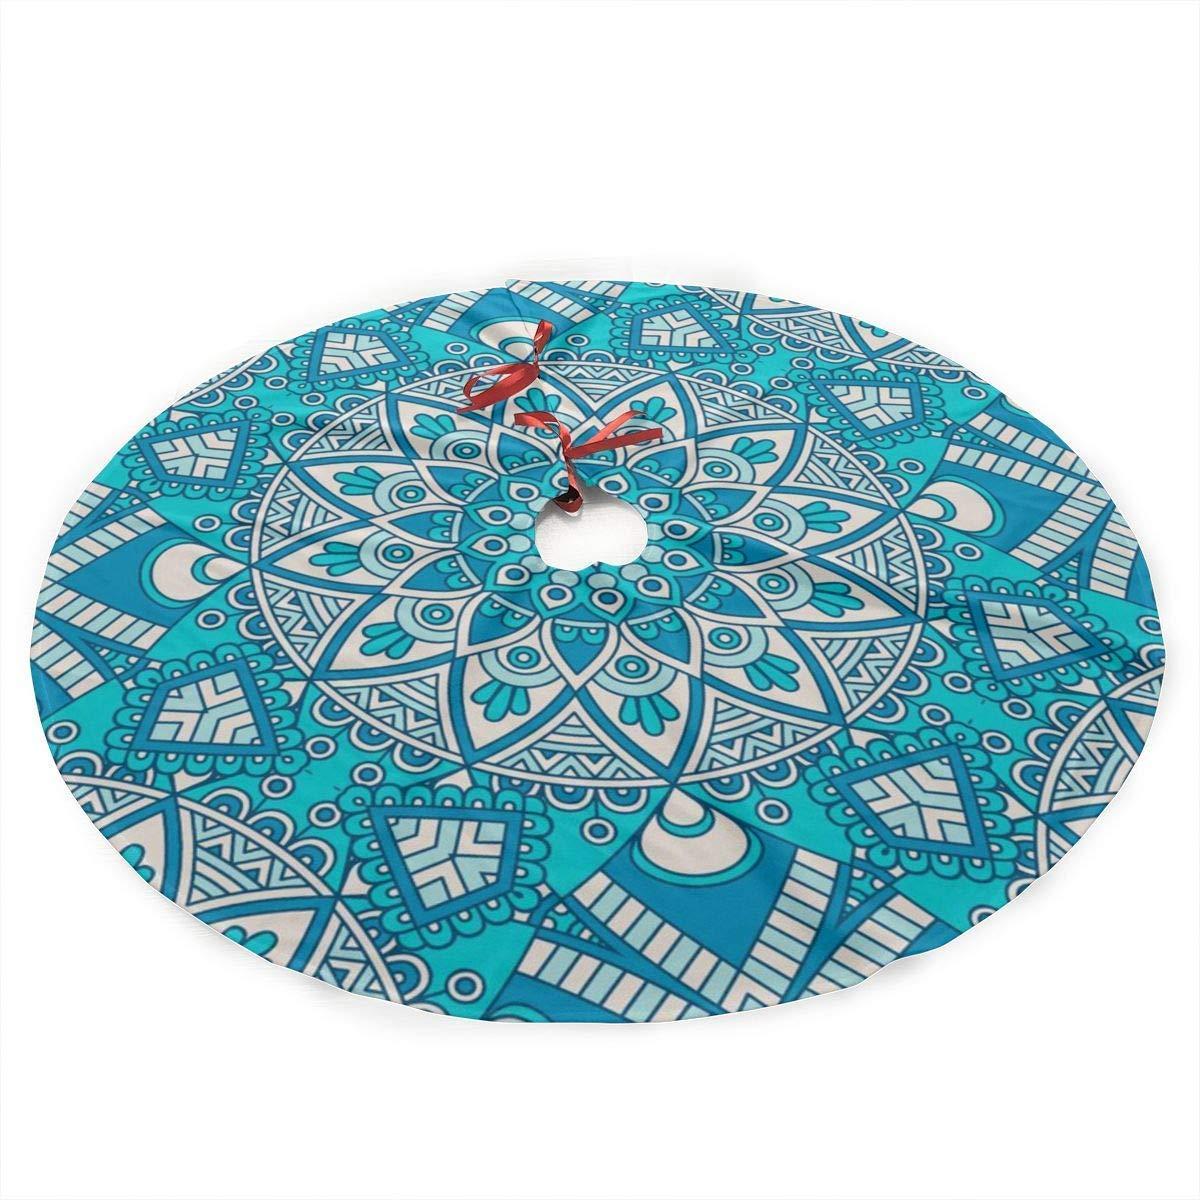 xifengquyuanyuanbaihuodian Mandala Vintage Fleurs Boho Jupe darbre De No/ël Joyeux Arbre De No/ël,Jupe darbre pour D/écoration De No/ël D/écoration de F/ête